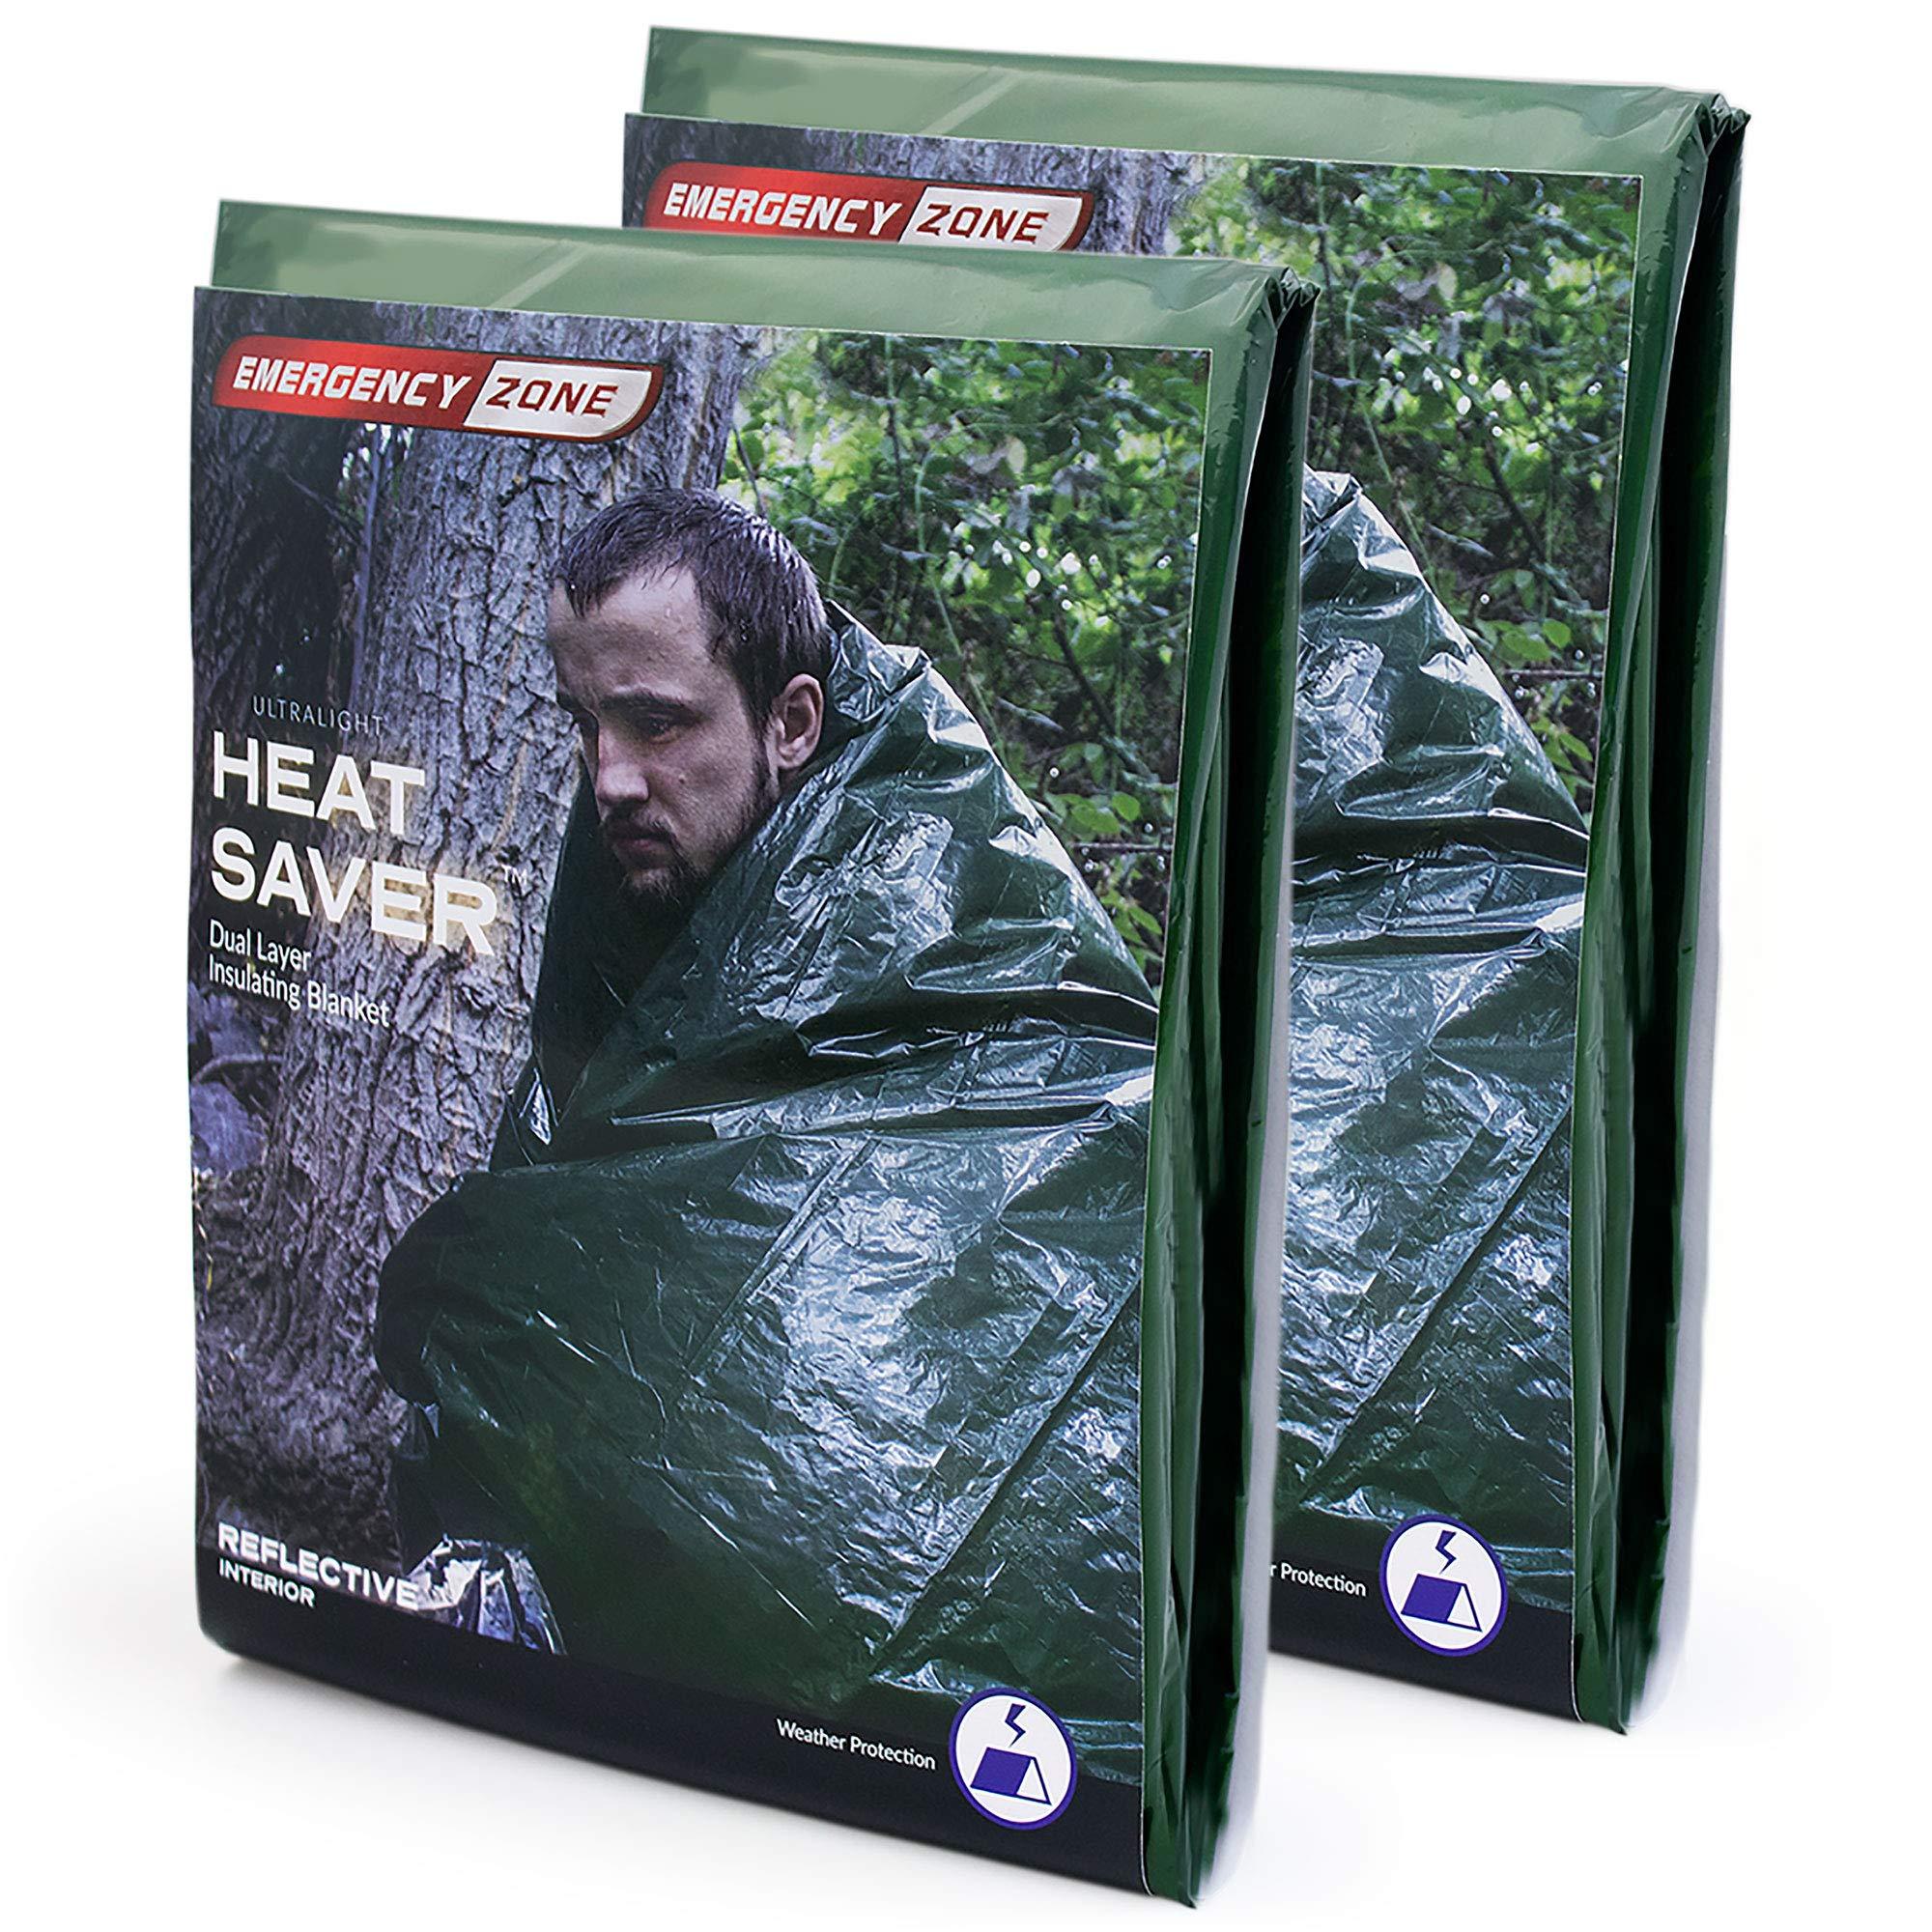 Emergency Zone Ultralight HeatSaver Dual Layer Insulating Emergency Blanket. 2 Pack